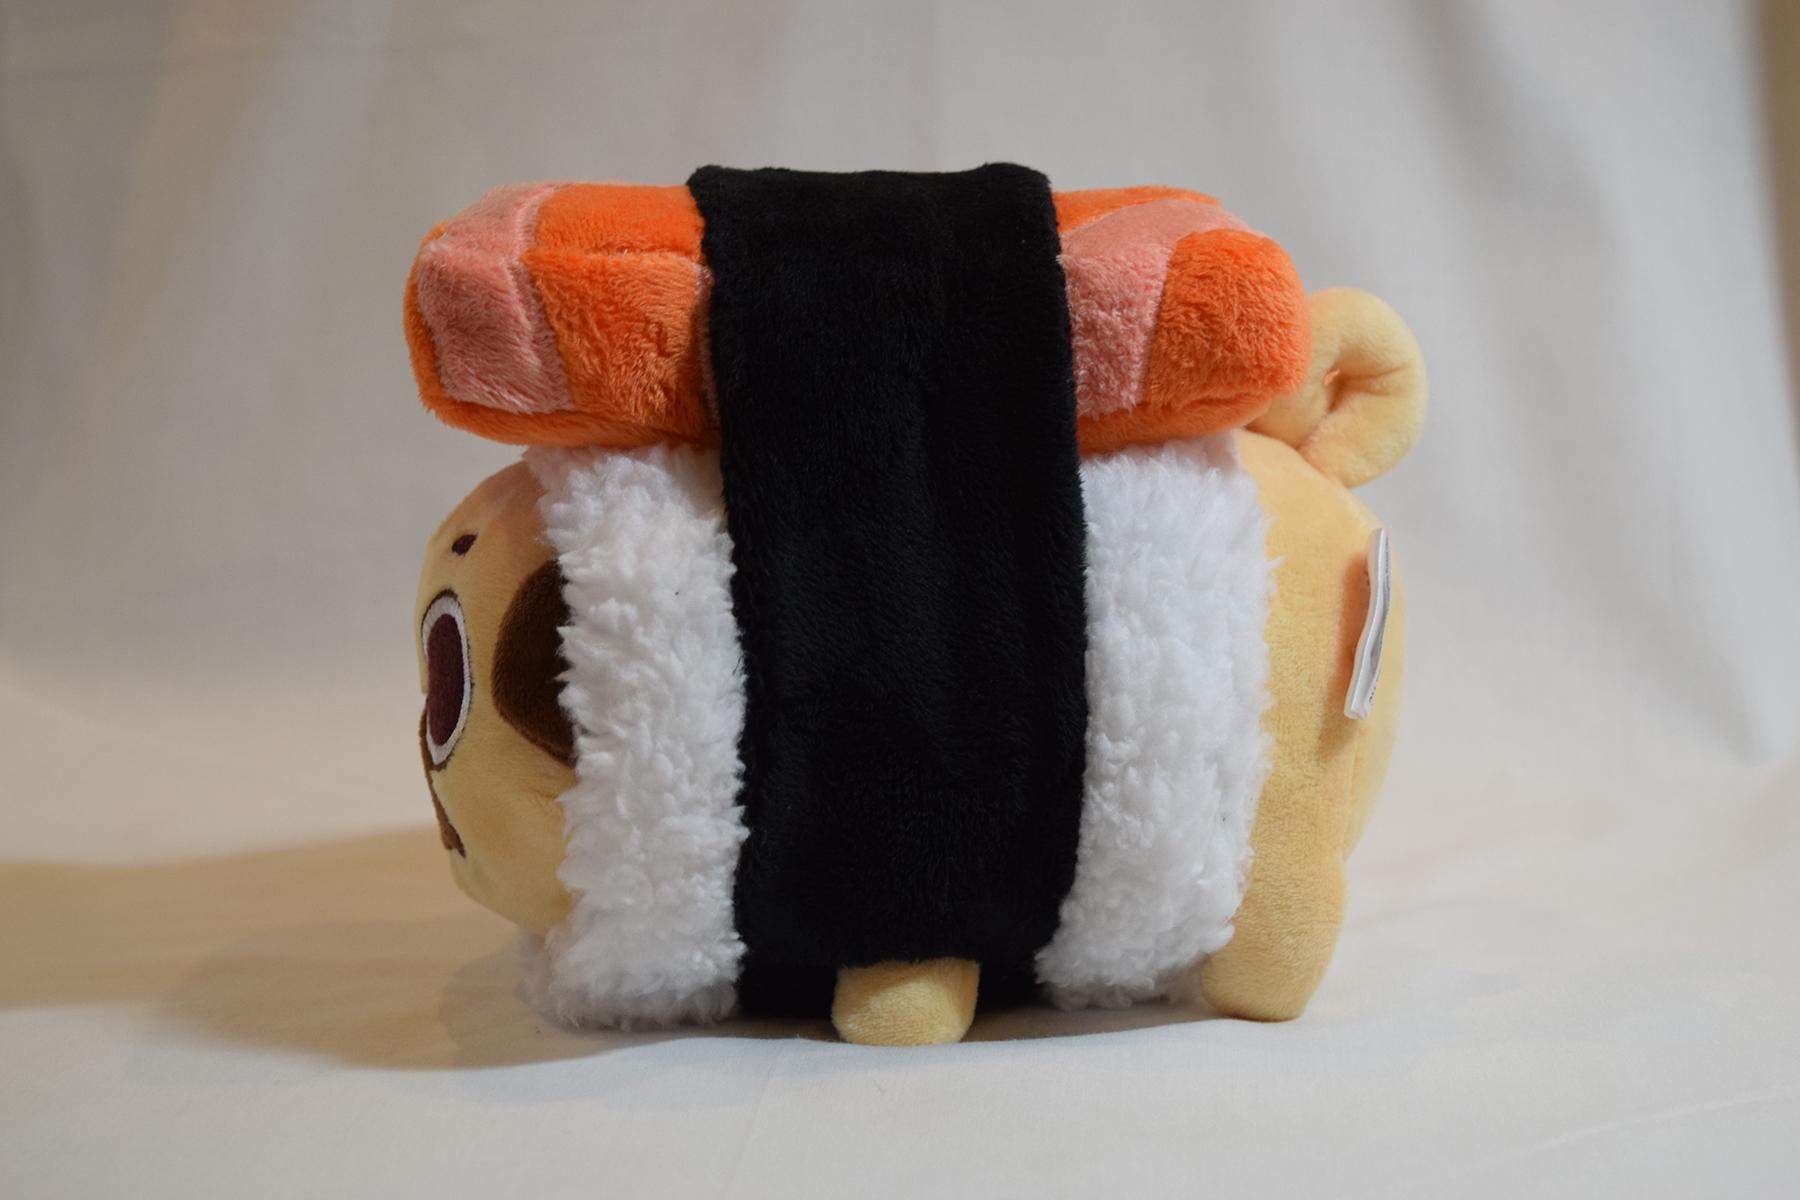 Puglie sushi prototype_4.JPG